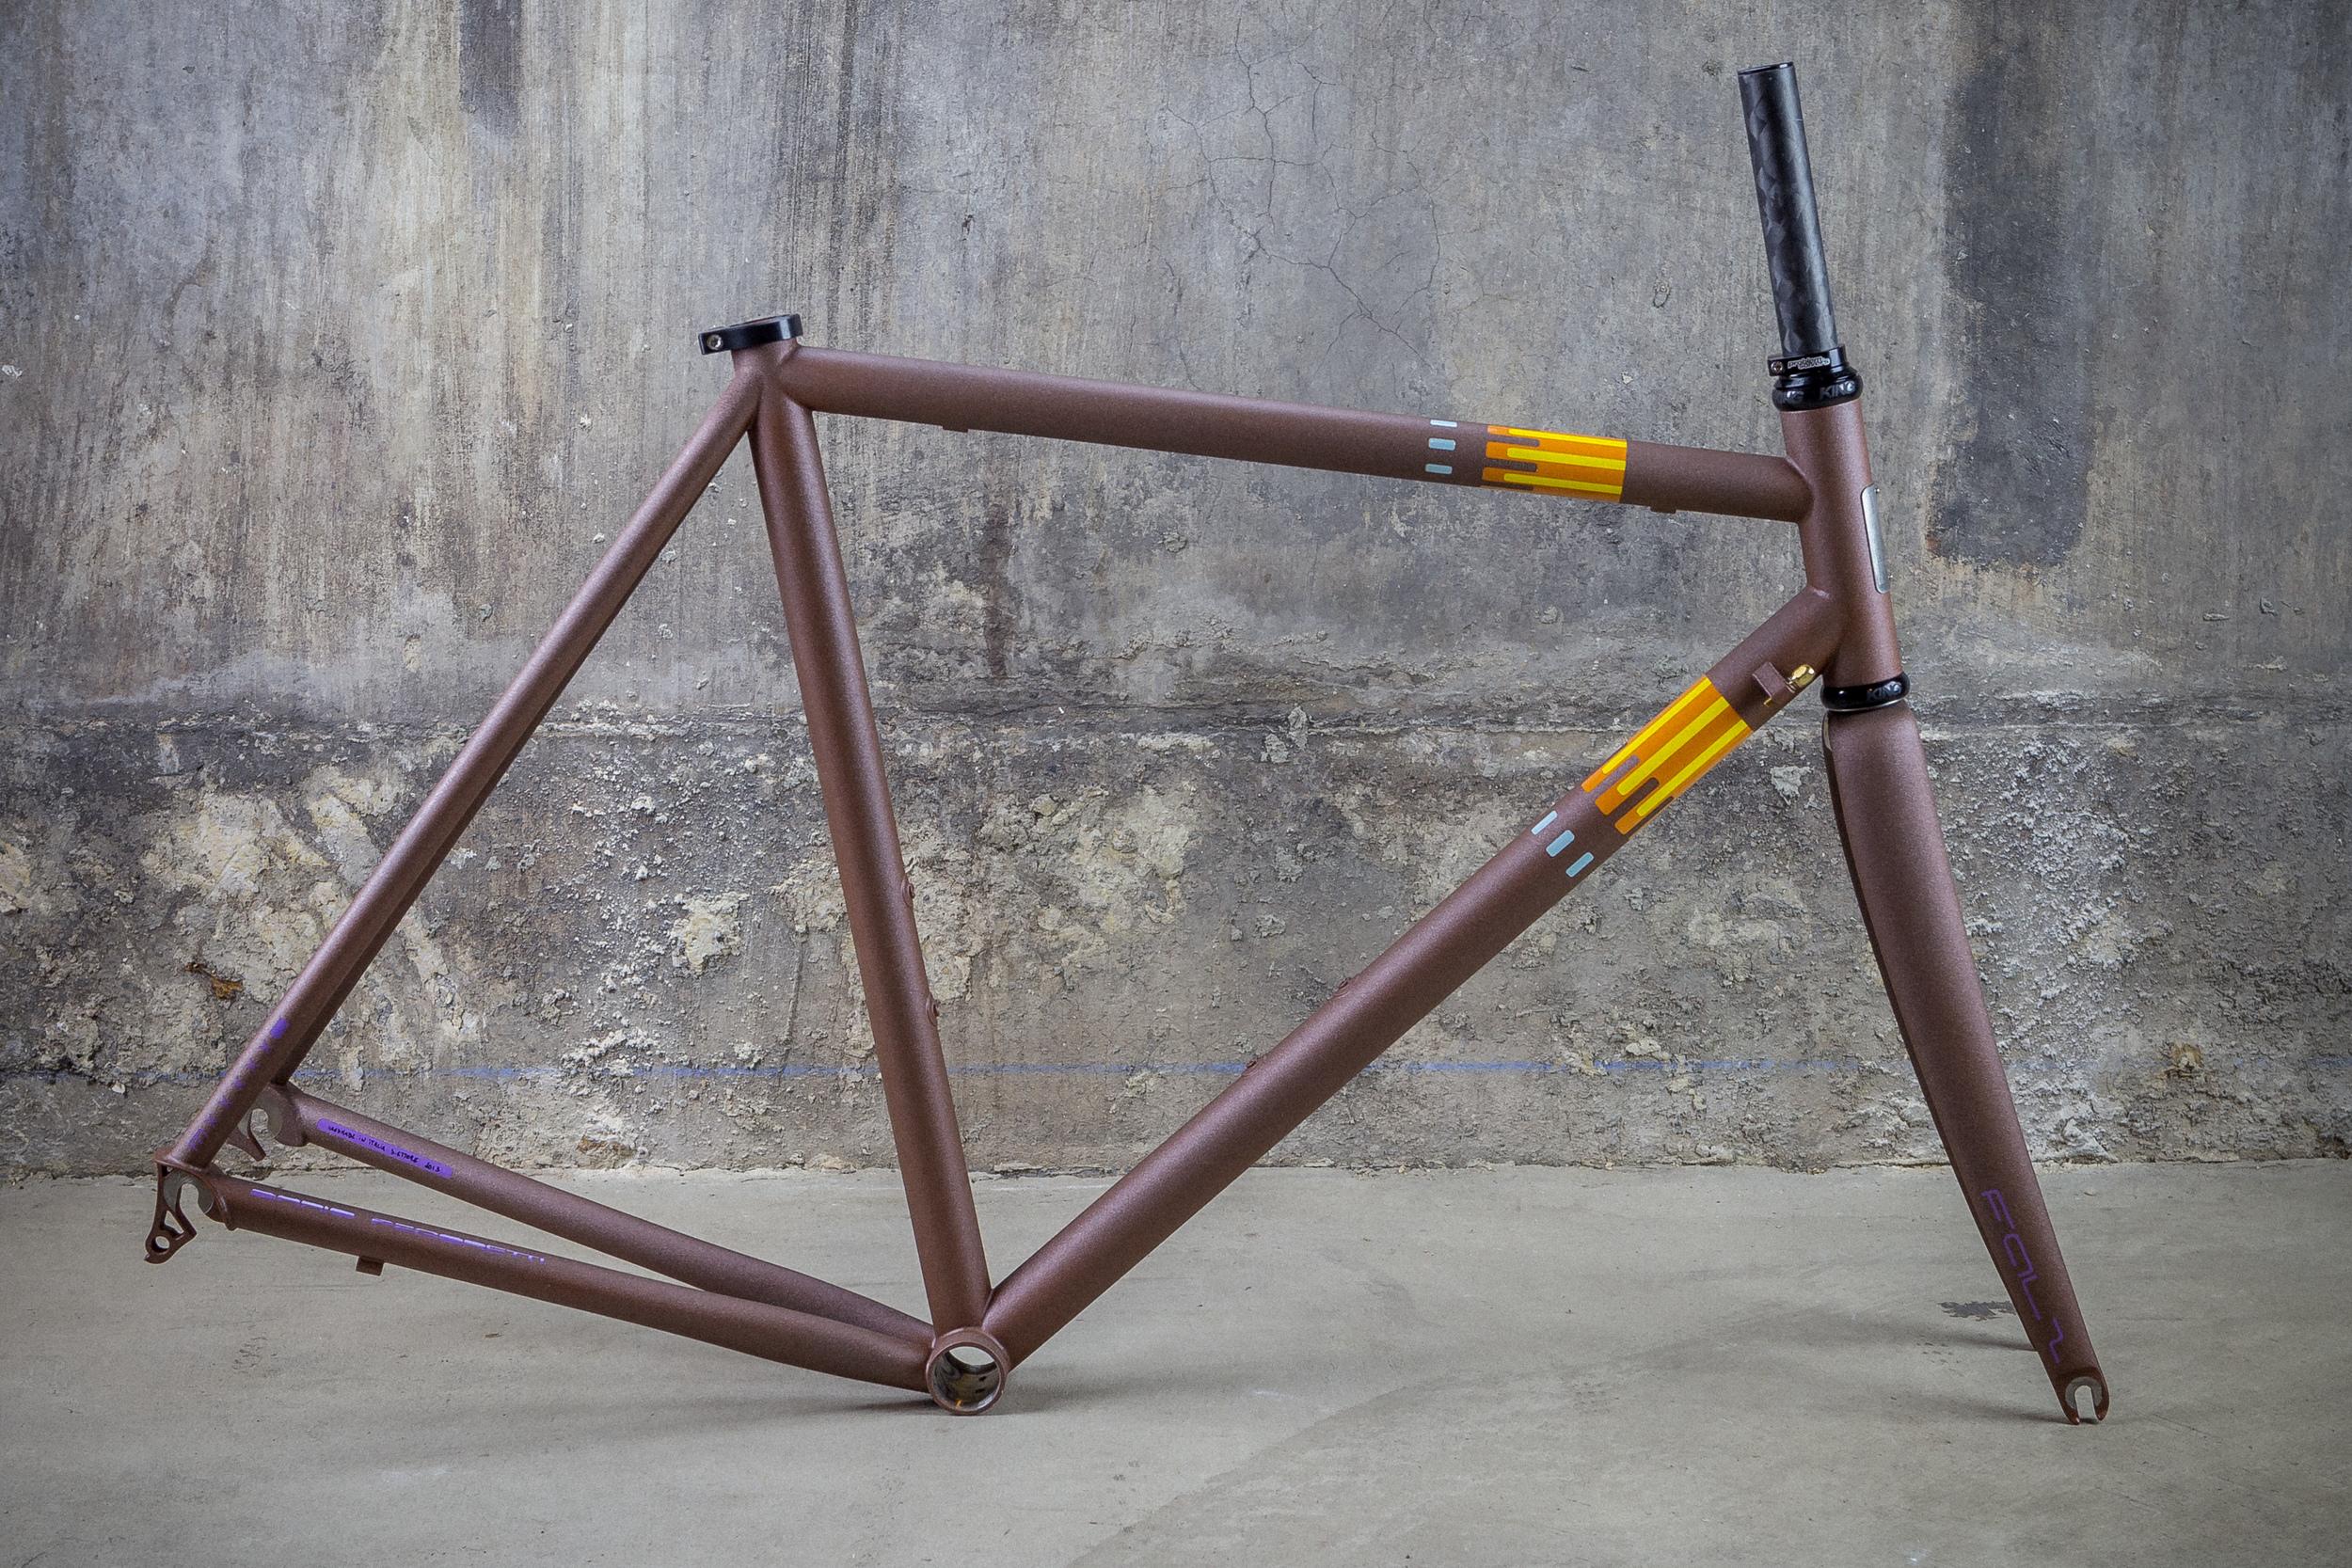 Pegoretti-Marcelo-Conn-Rust-.jpg